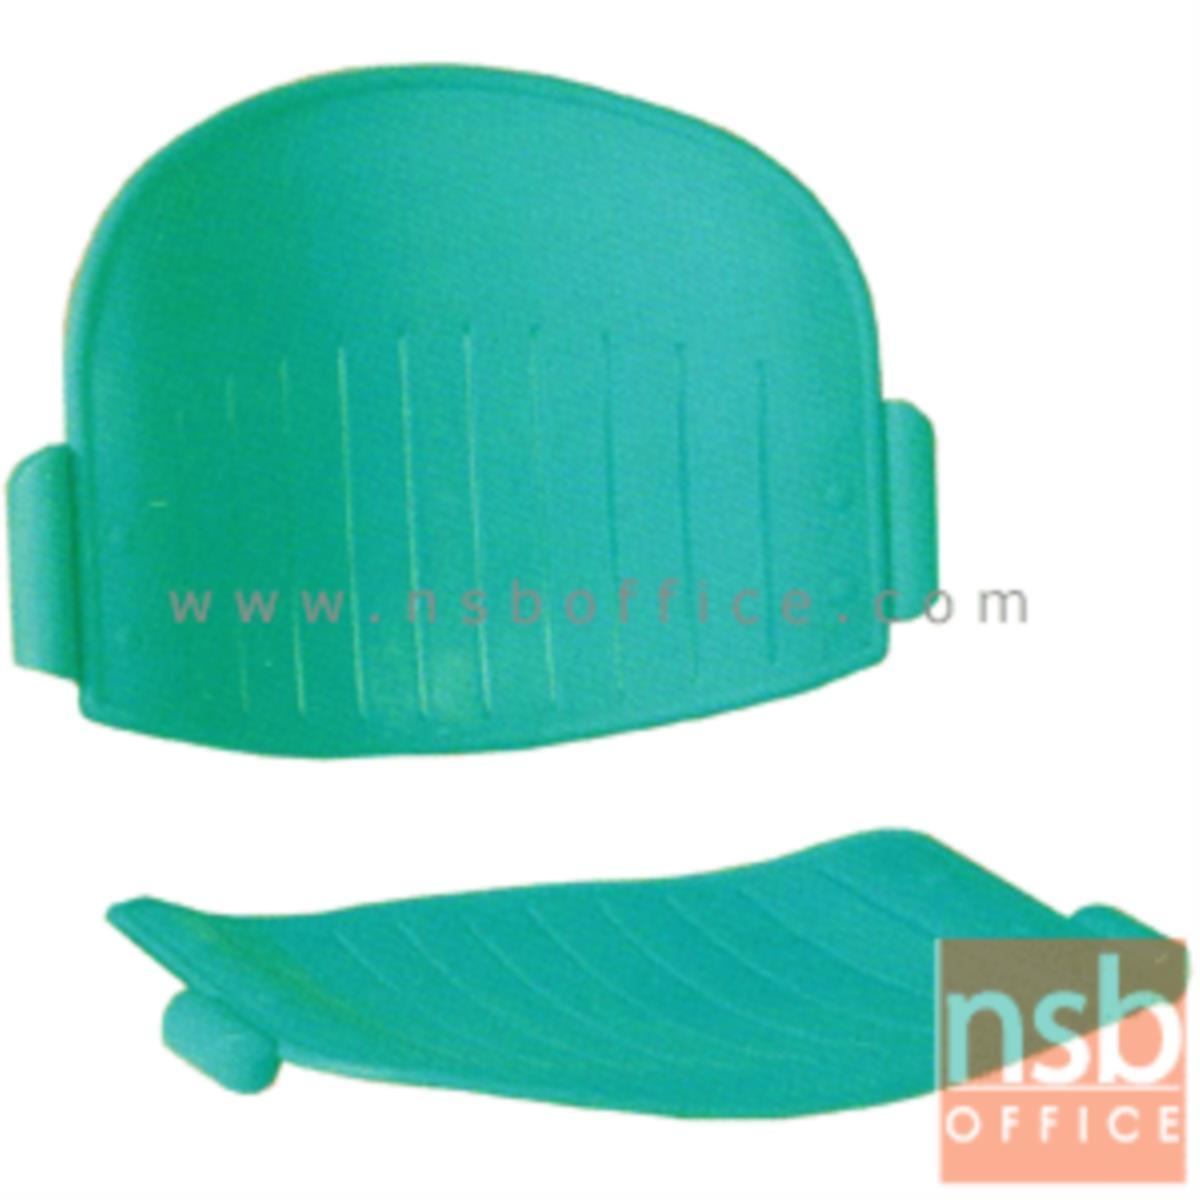 B27A016:เปลือกพลาสติกโพลี่ (PP) รุ่น Courgette (คอเกต)